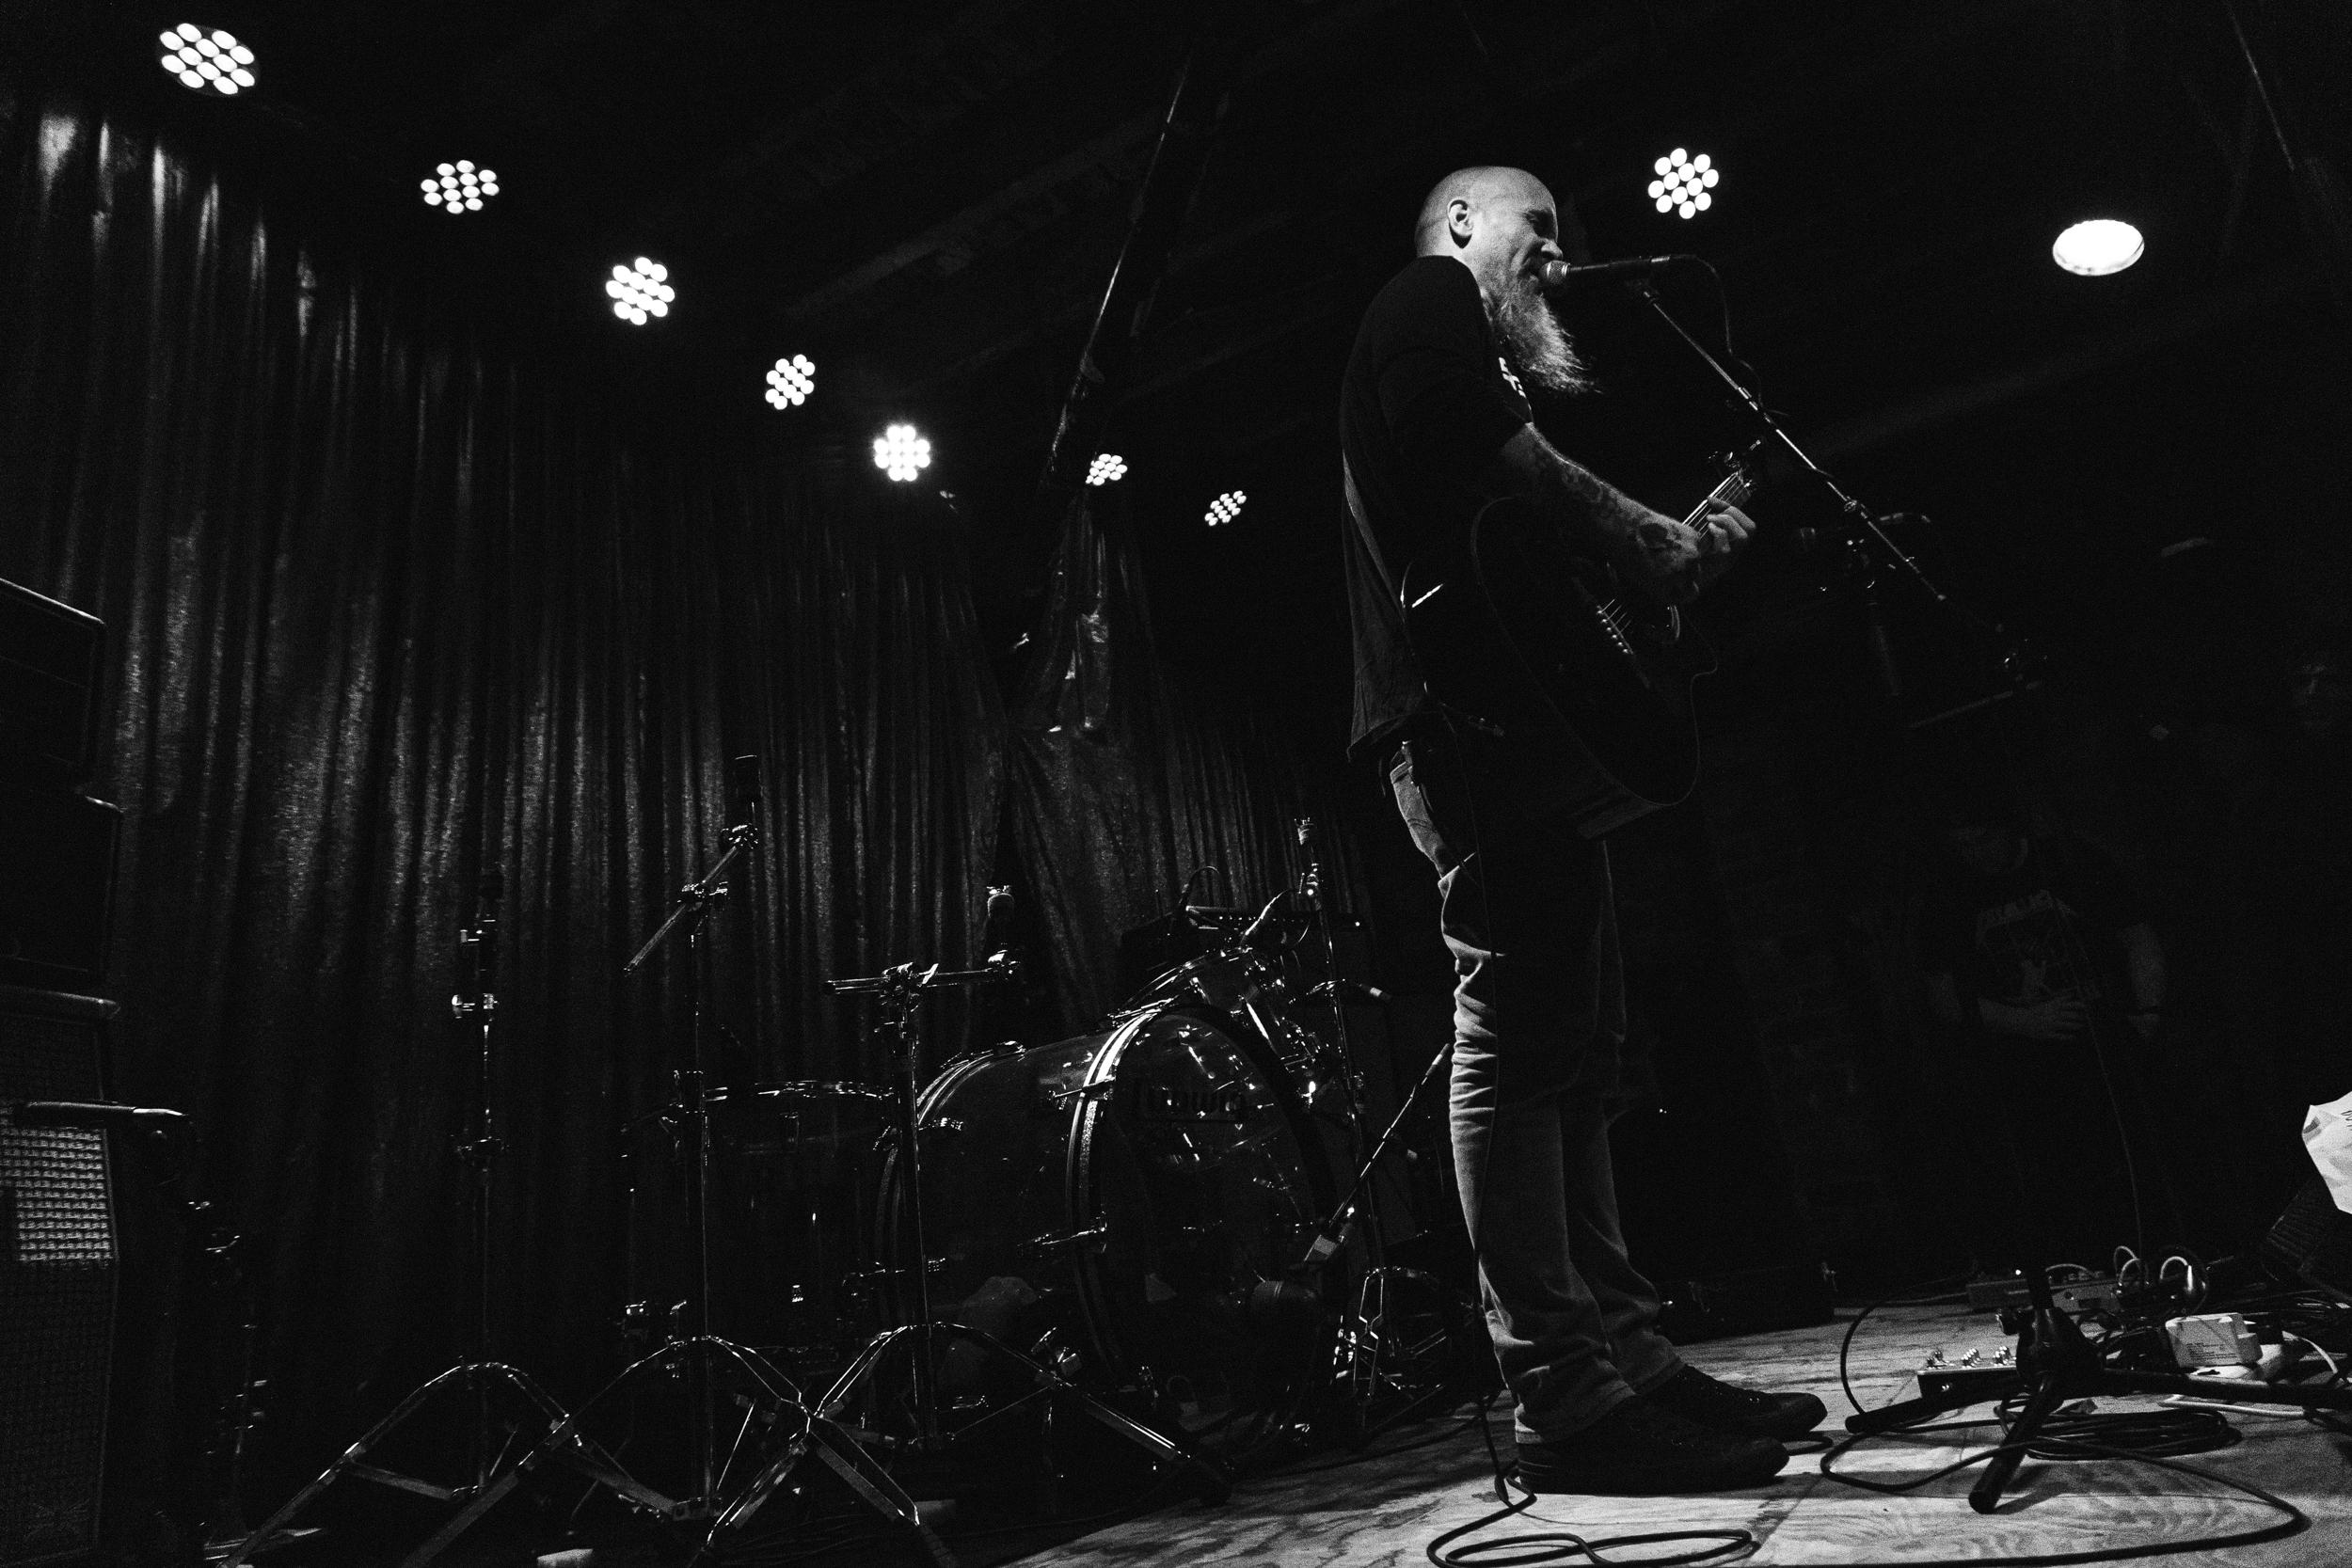 Nick O Acoustic_CherryBar-4900.jpg